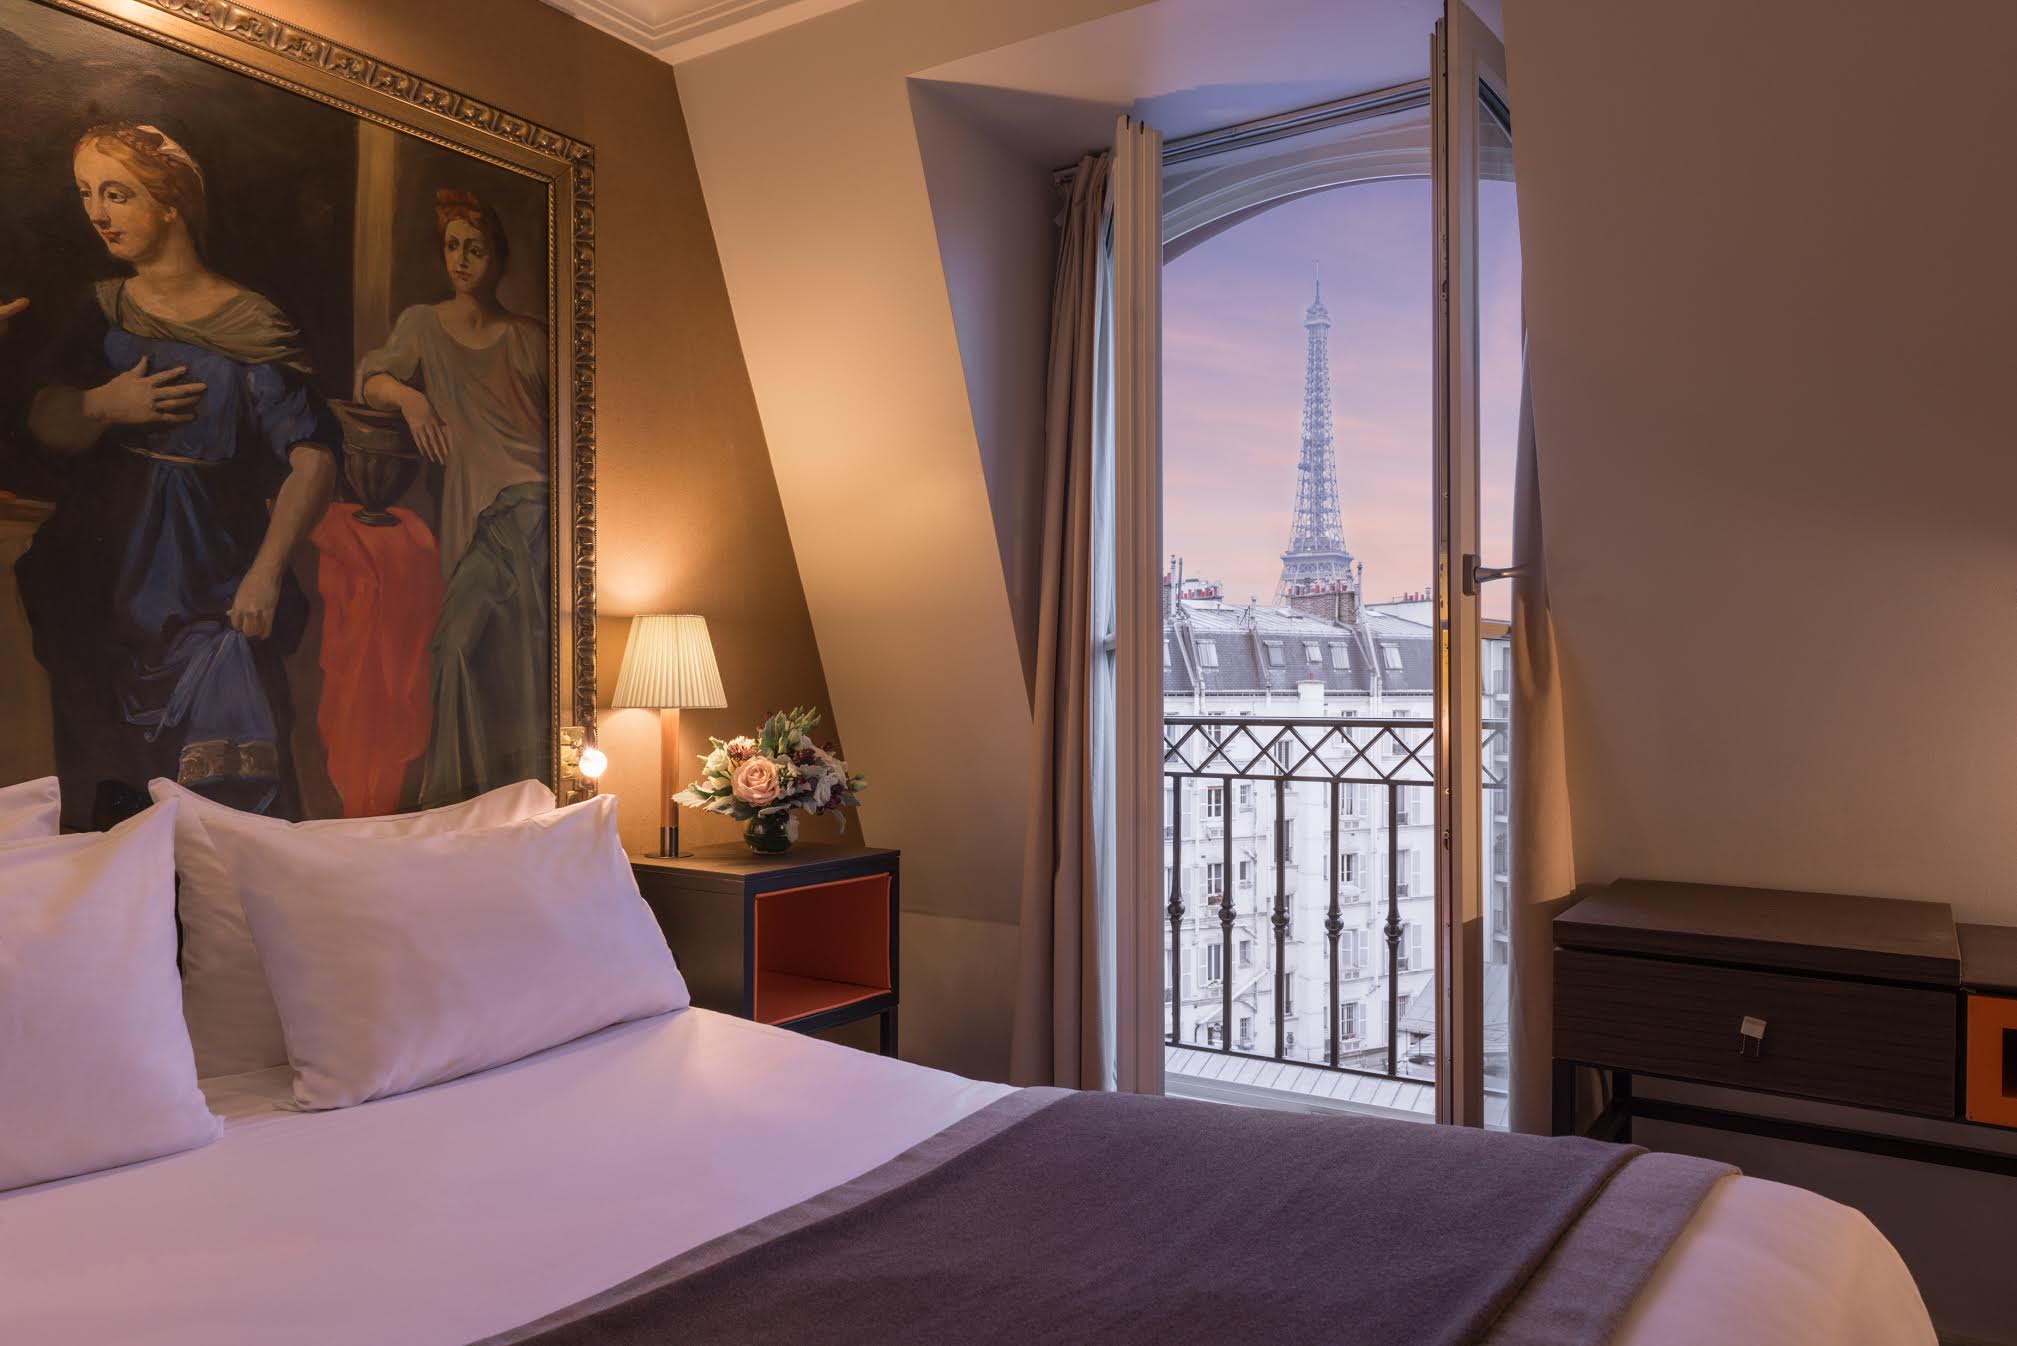 Hotel Walt - Paris Hotels with Eiffel Tower View 2019